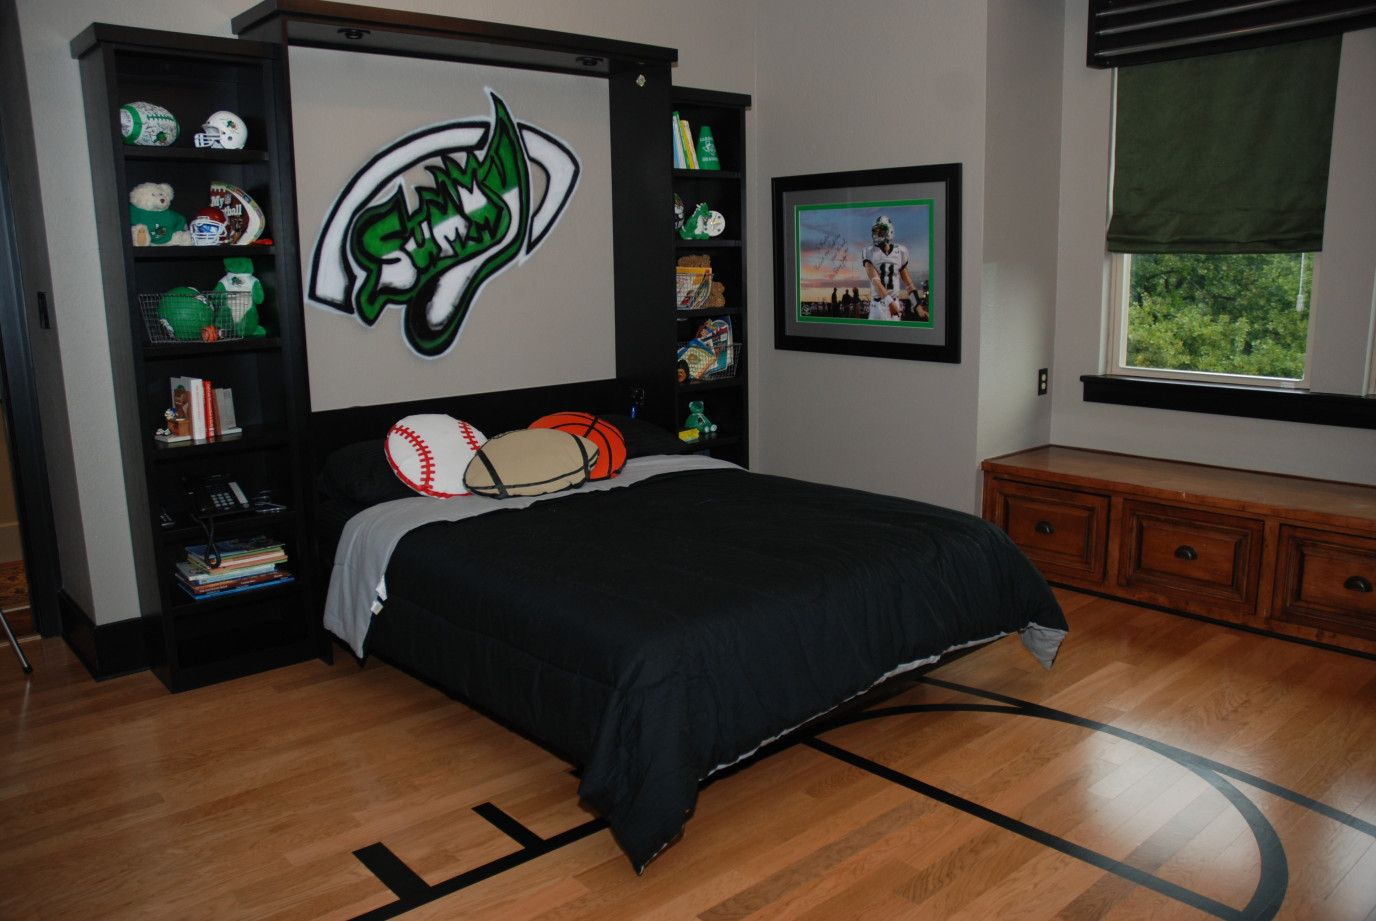 Simple house interior design ideas  basketball themed bedrooms  interior design ideas for bedrooms